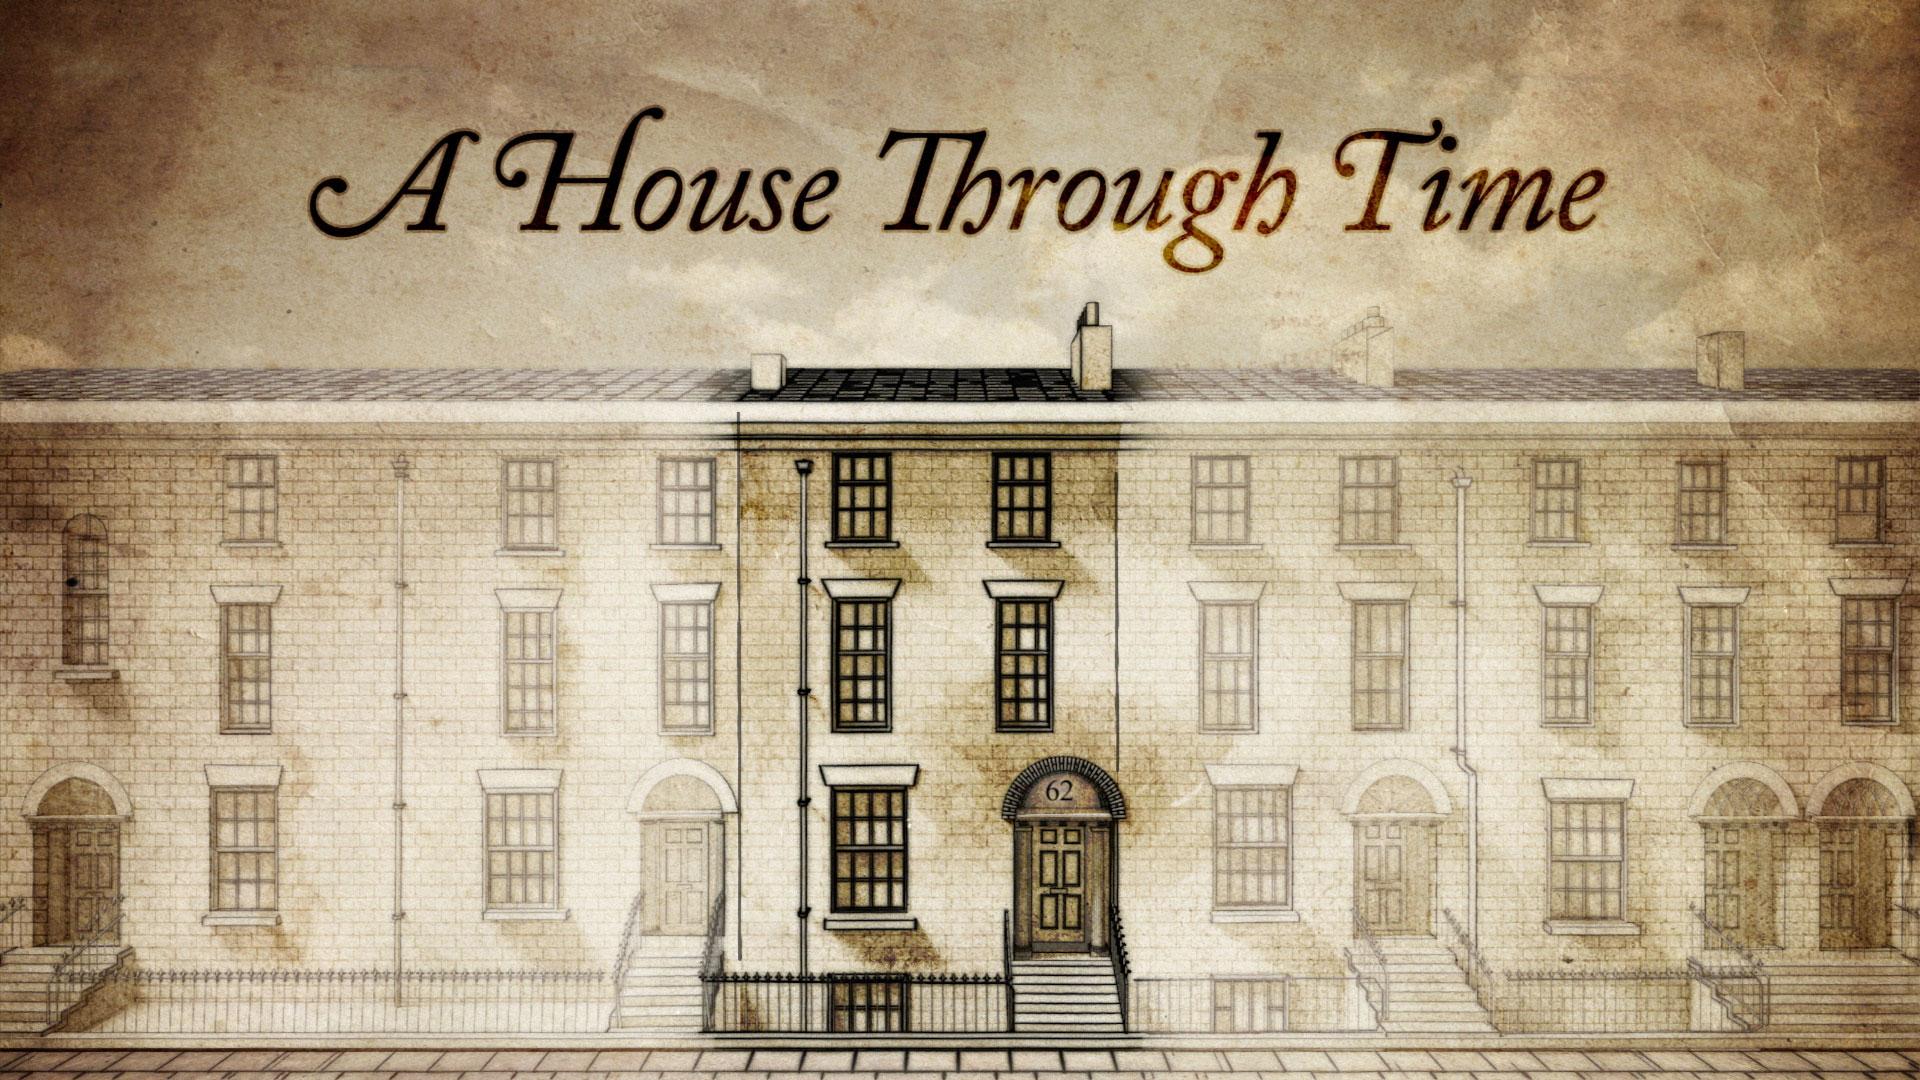 A House Through Time © Holey & Moley Ltd